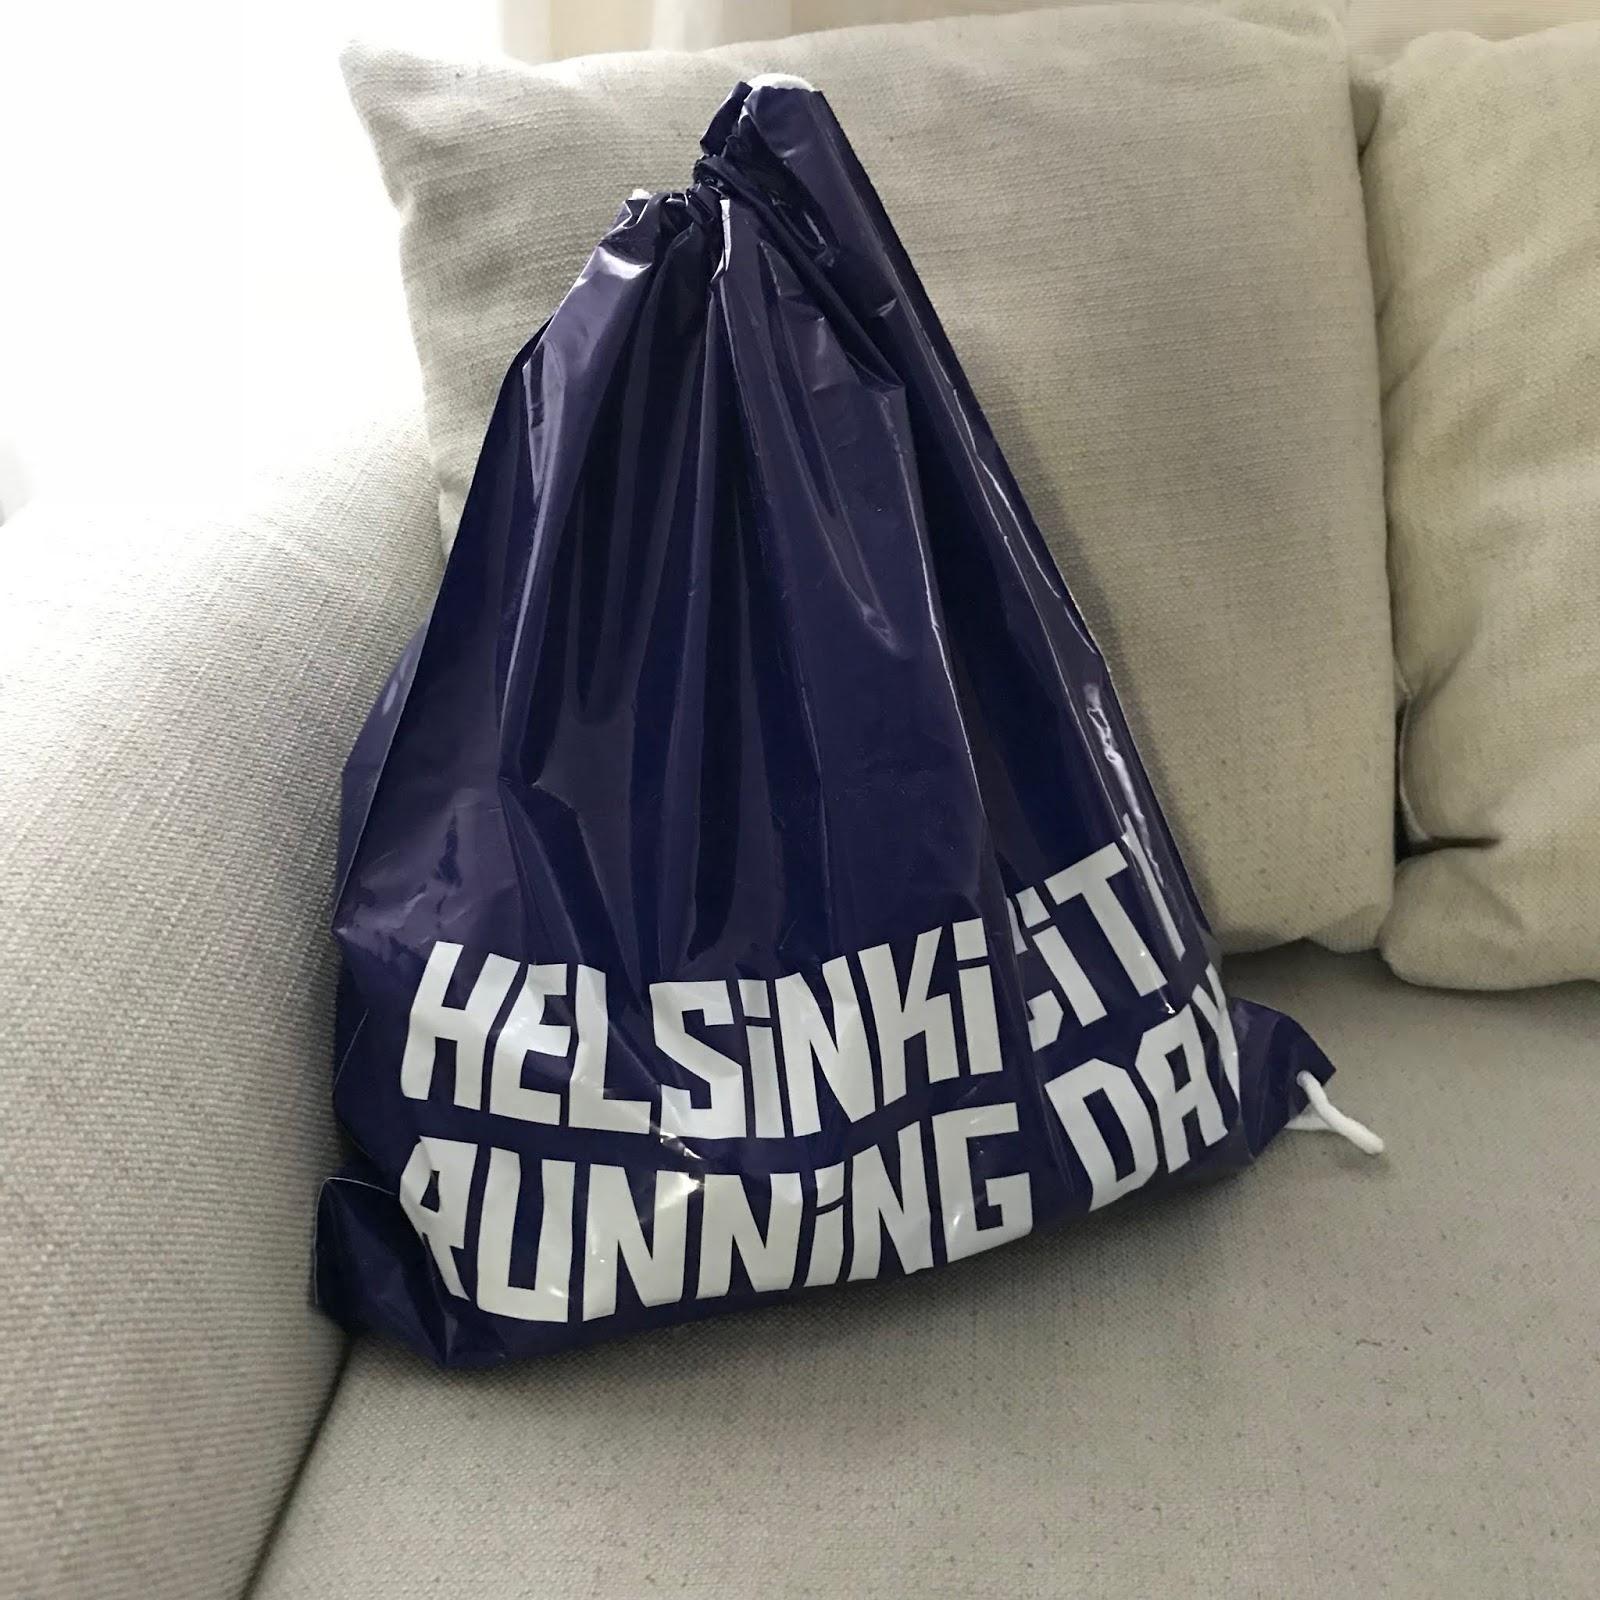 Helsinki City Running Day varustepussi